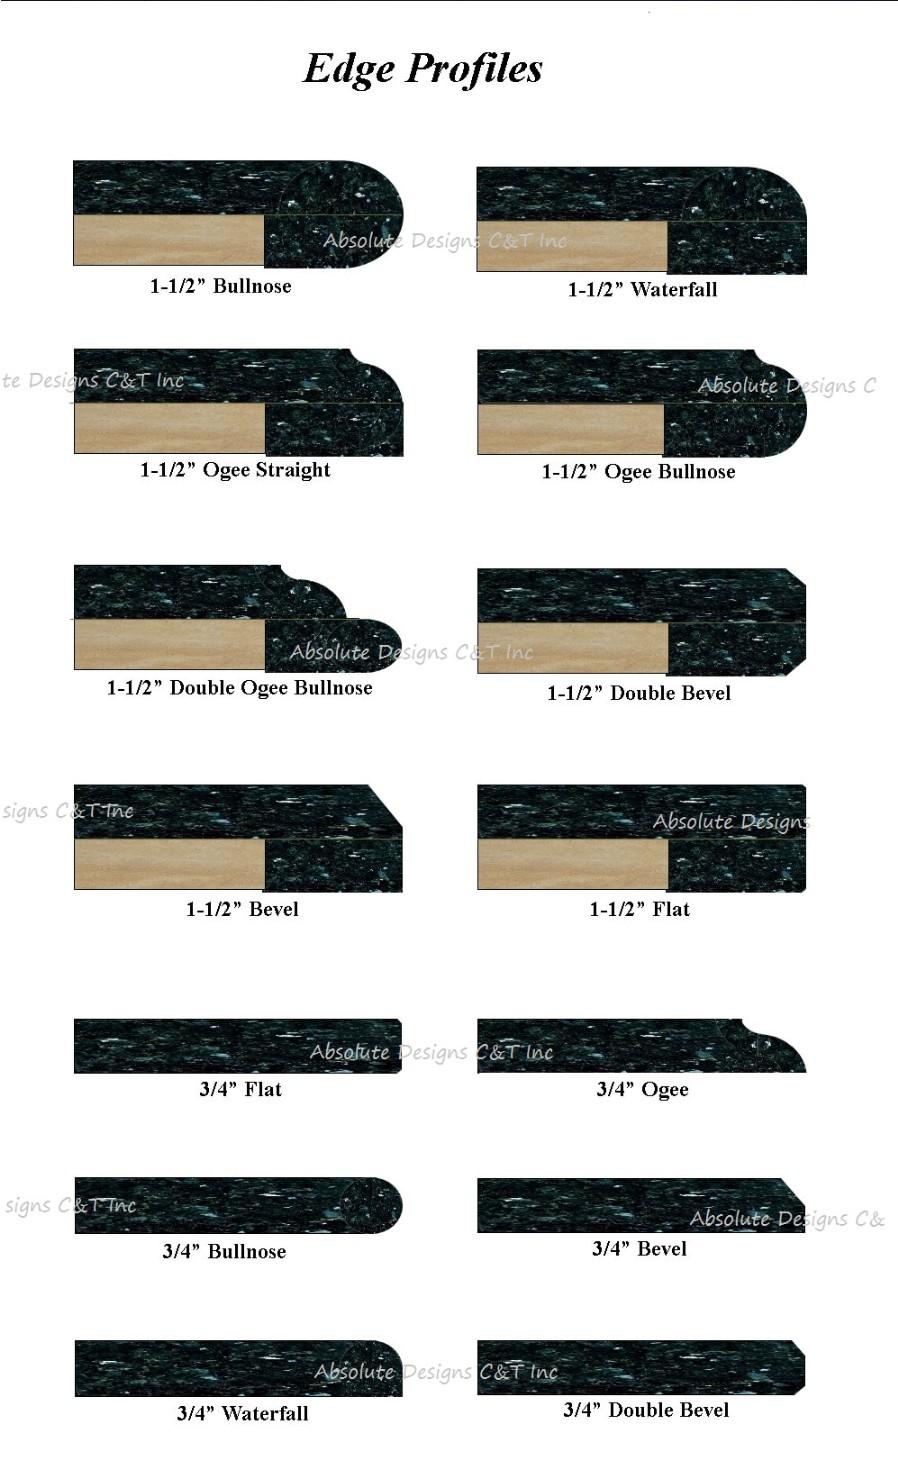 Edge Profiles Granite Countertops